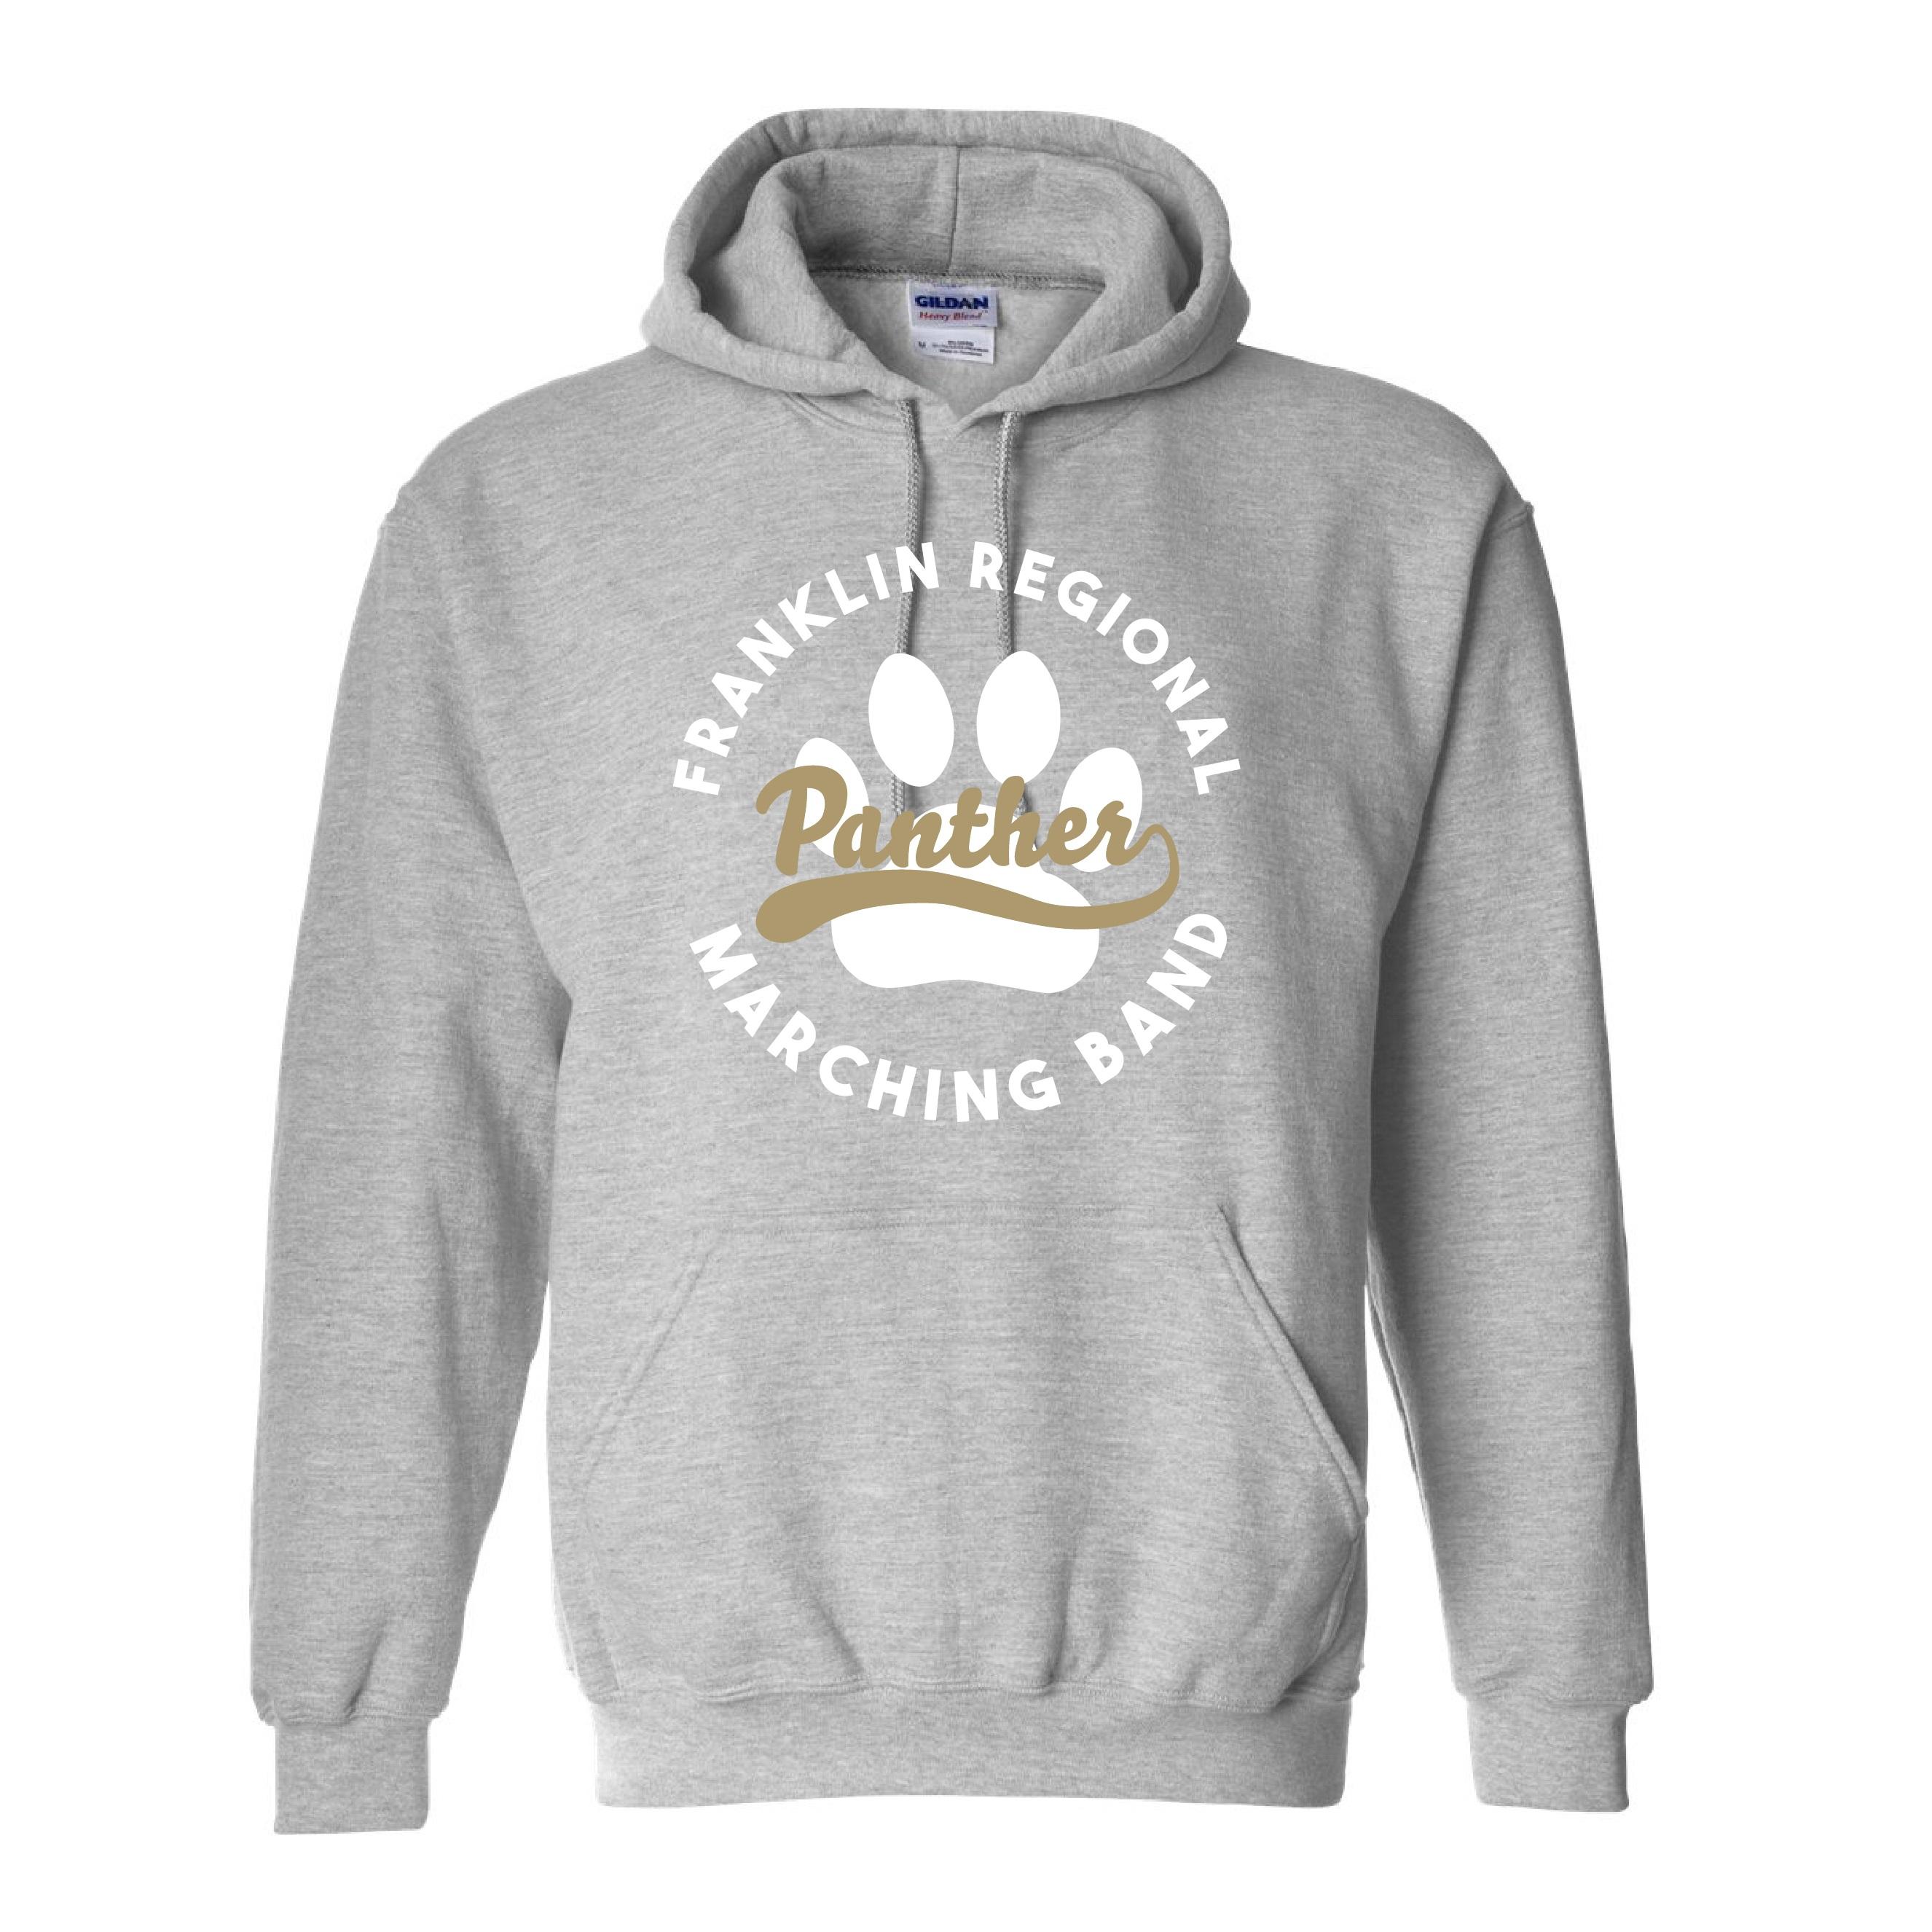 Gildan Heavy Blend Hooded Sweatshirt (Available in Navy or Grey)